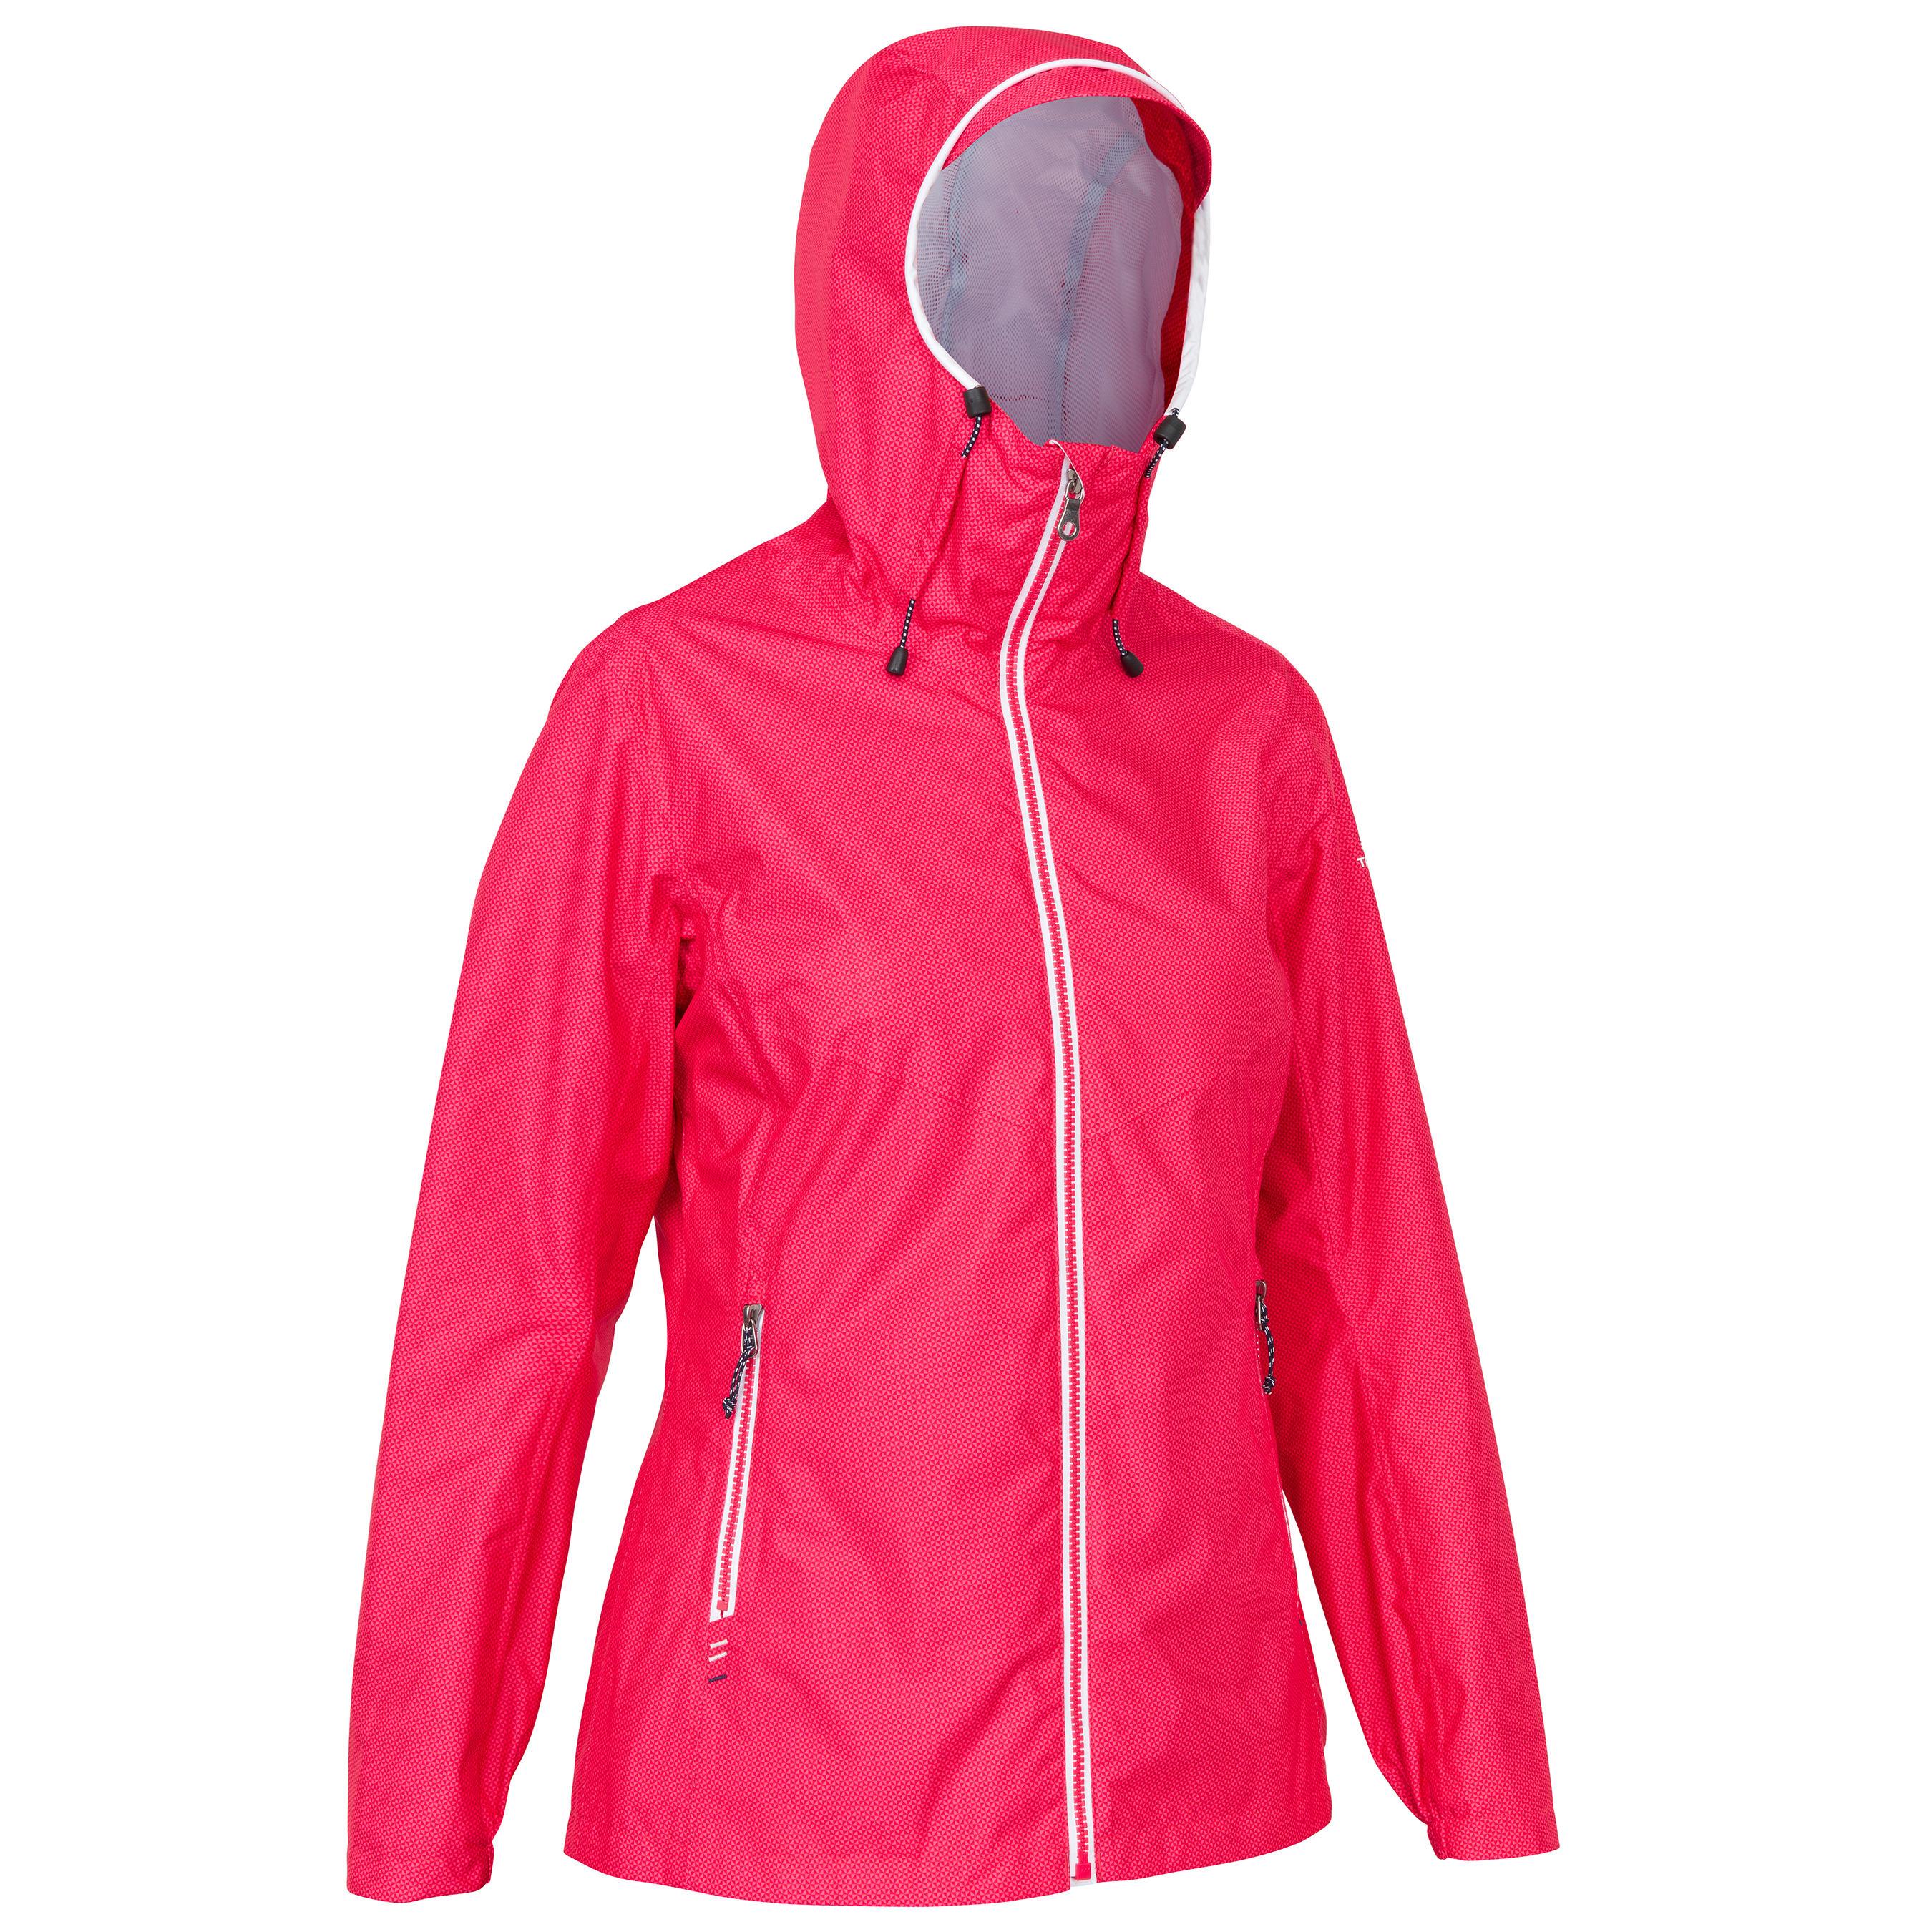 Jachetă Navigație100 Damă imagine produs